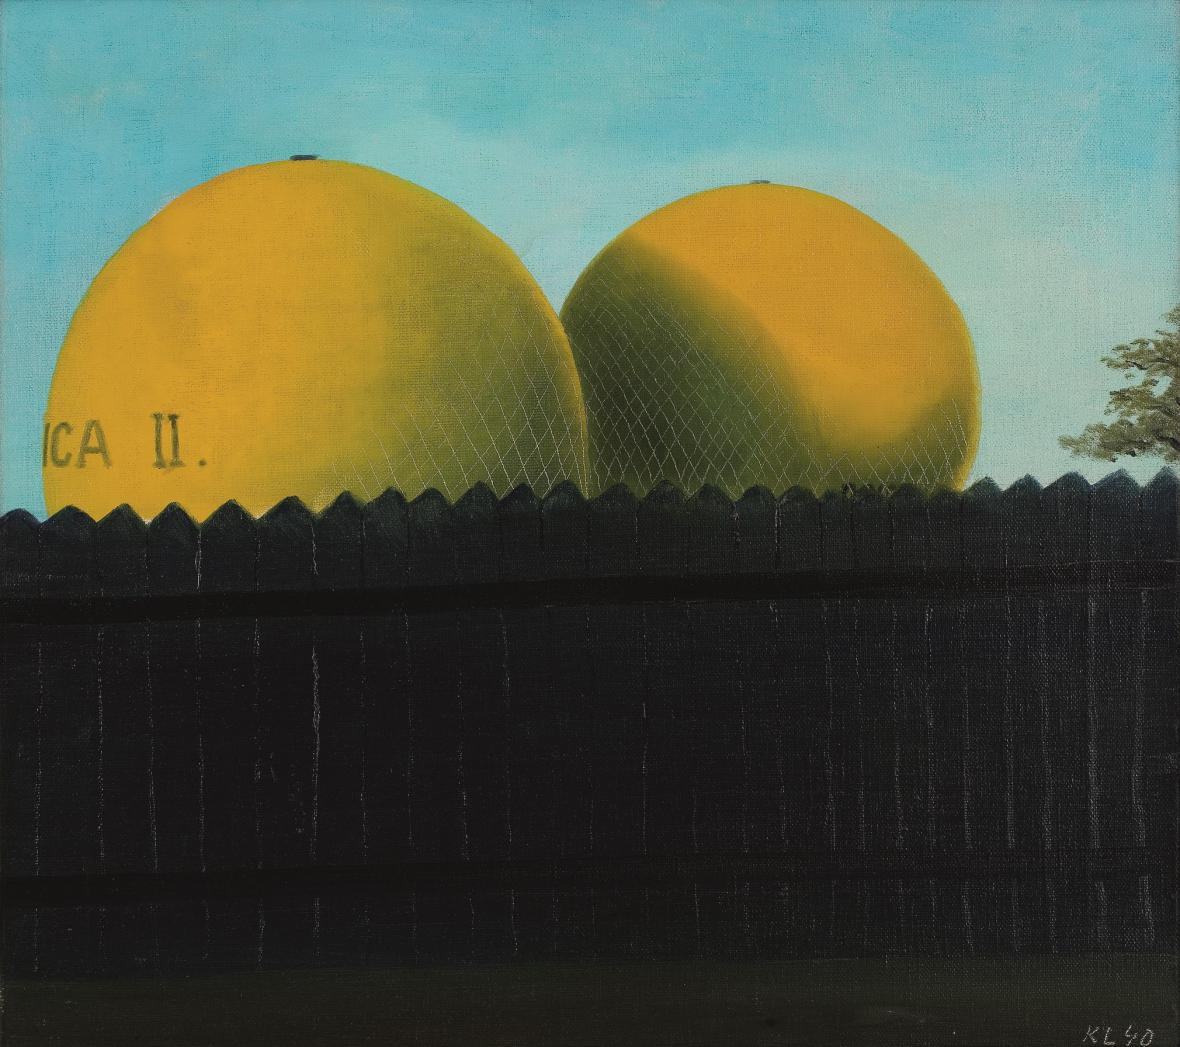 Balony v ohradě, 1940, Retro Gallery